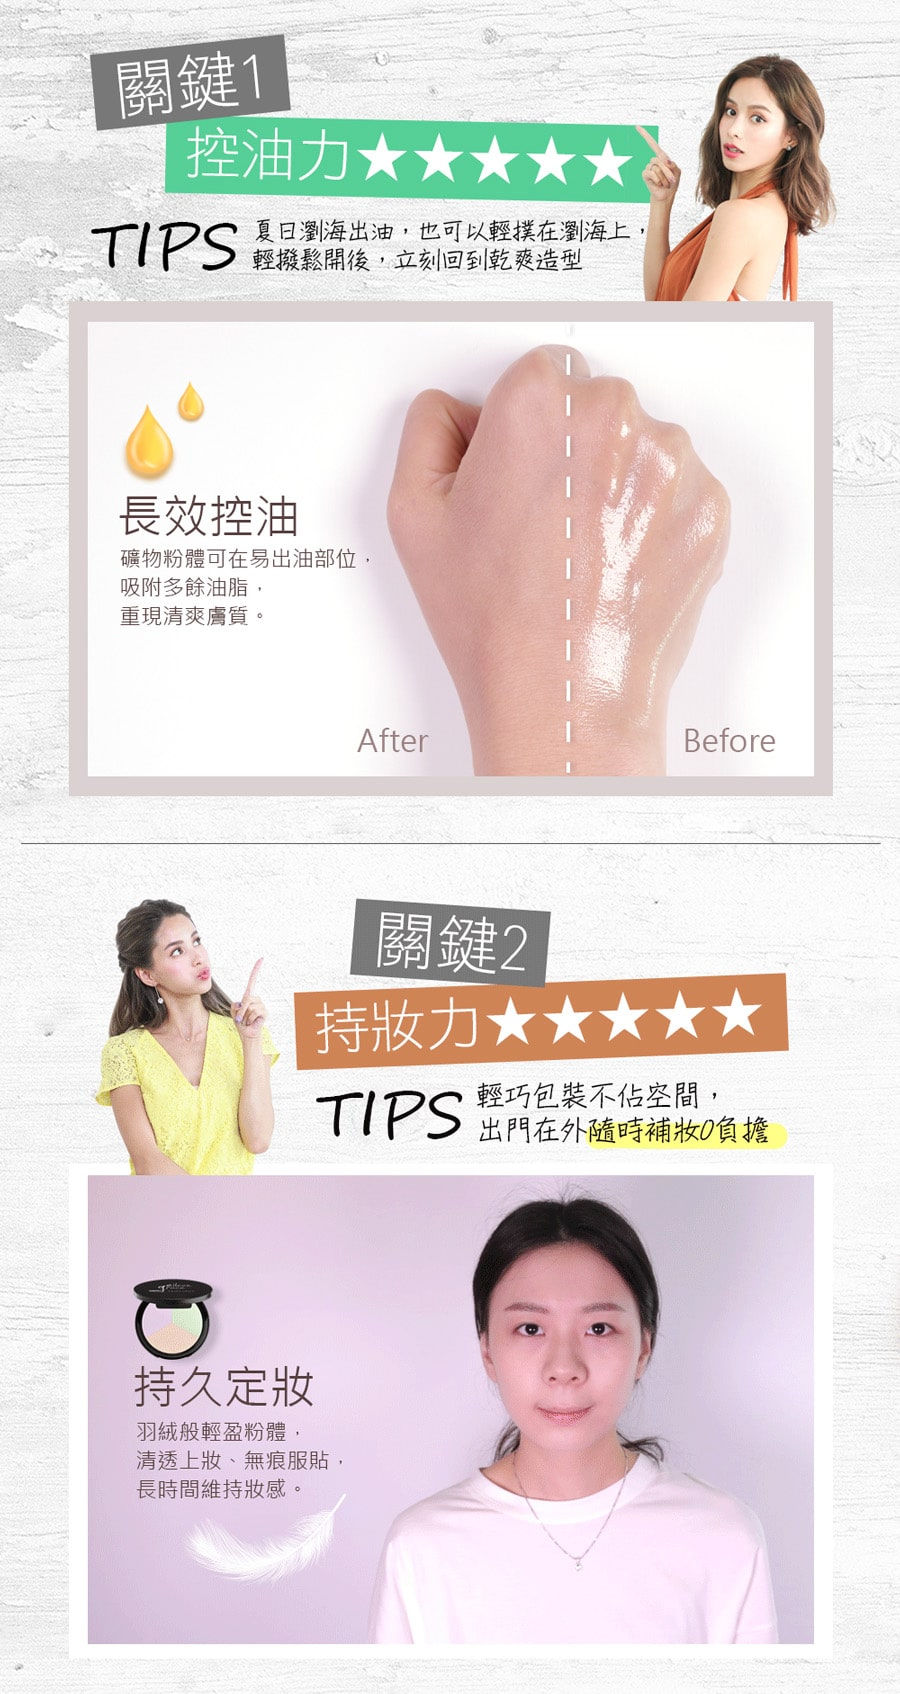 Air Light Finish Powder - Tips